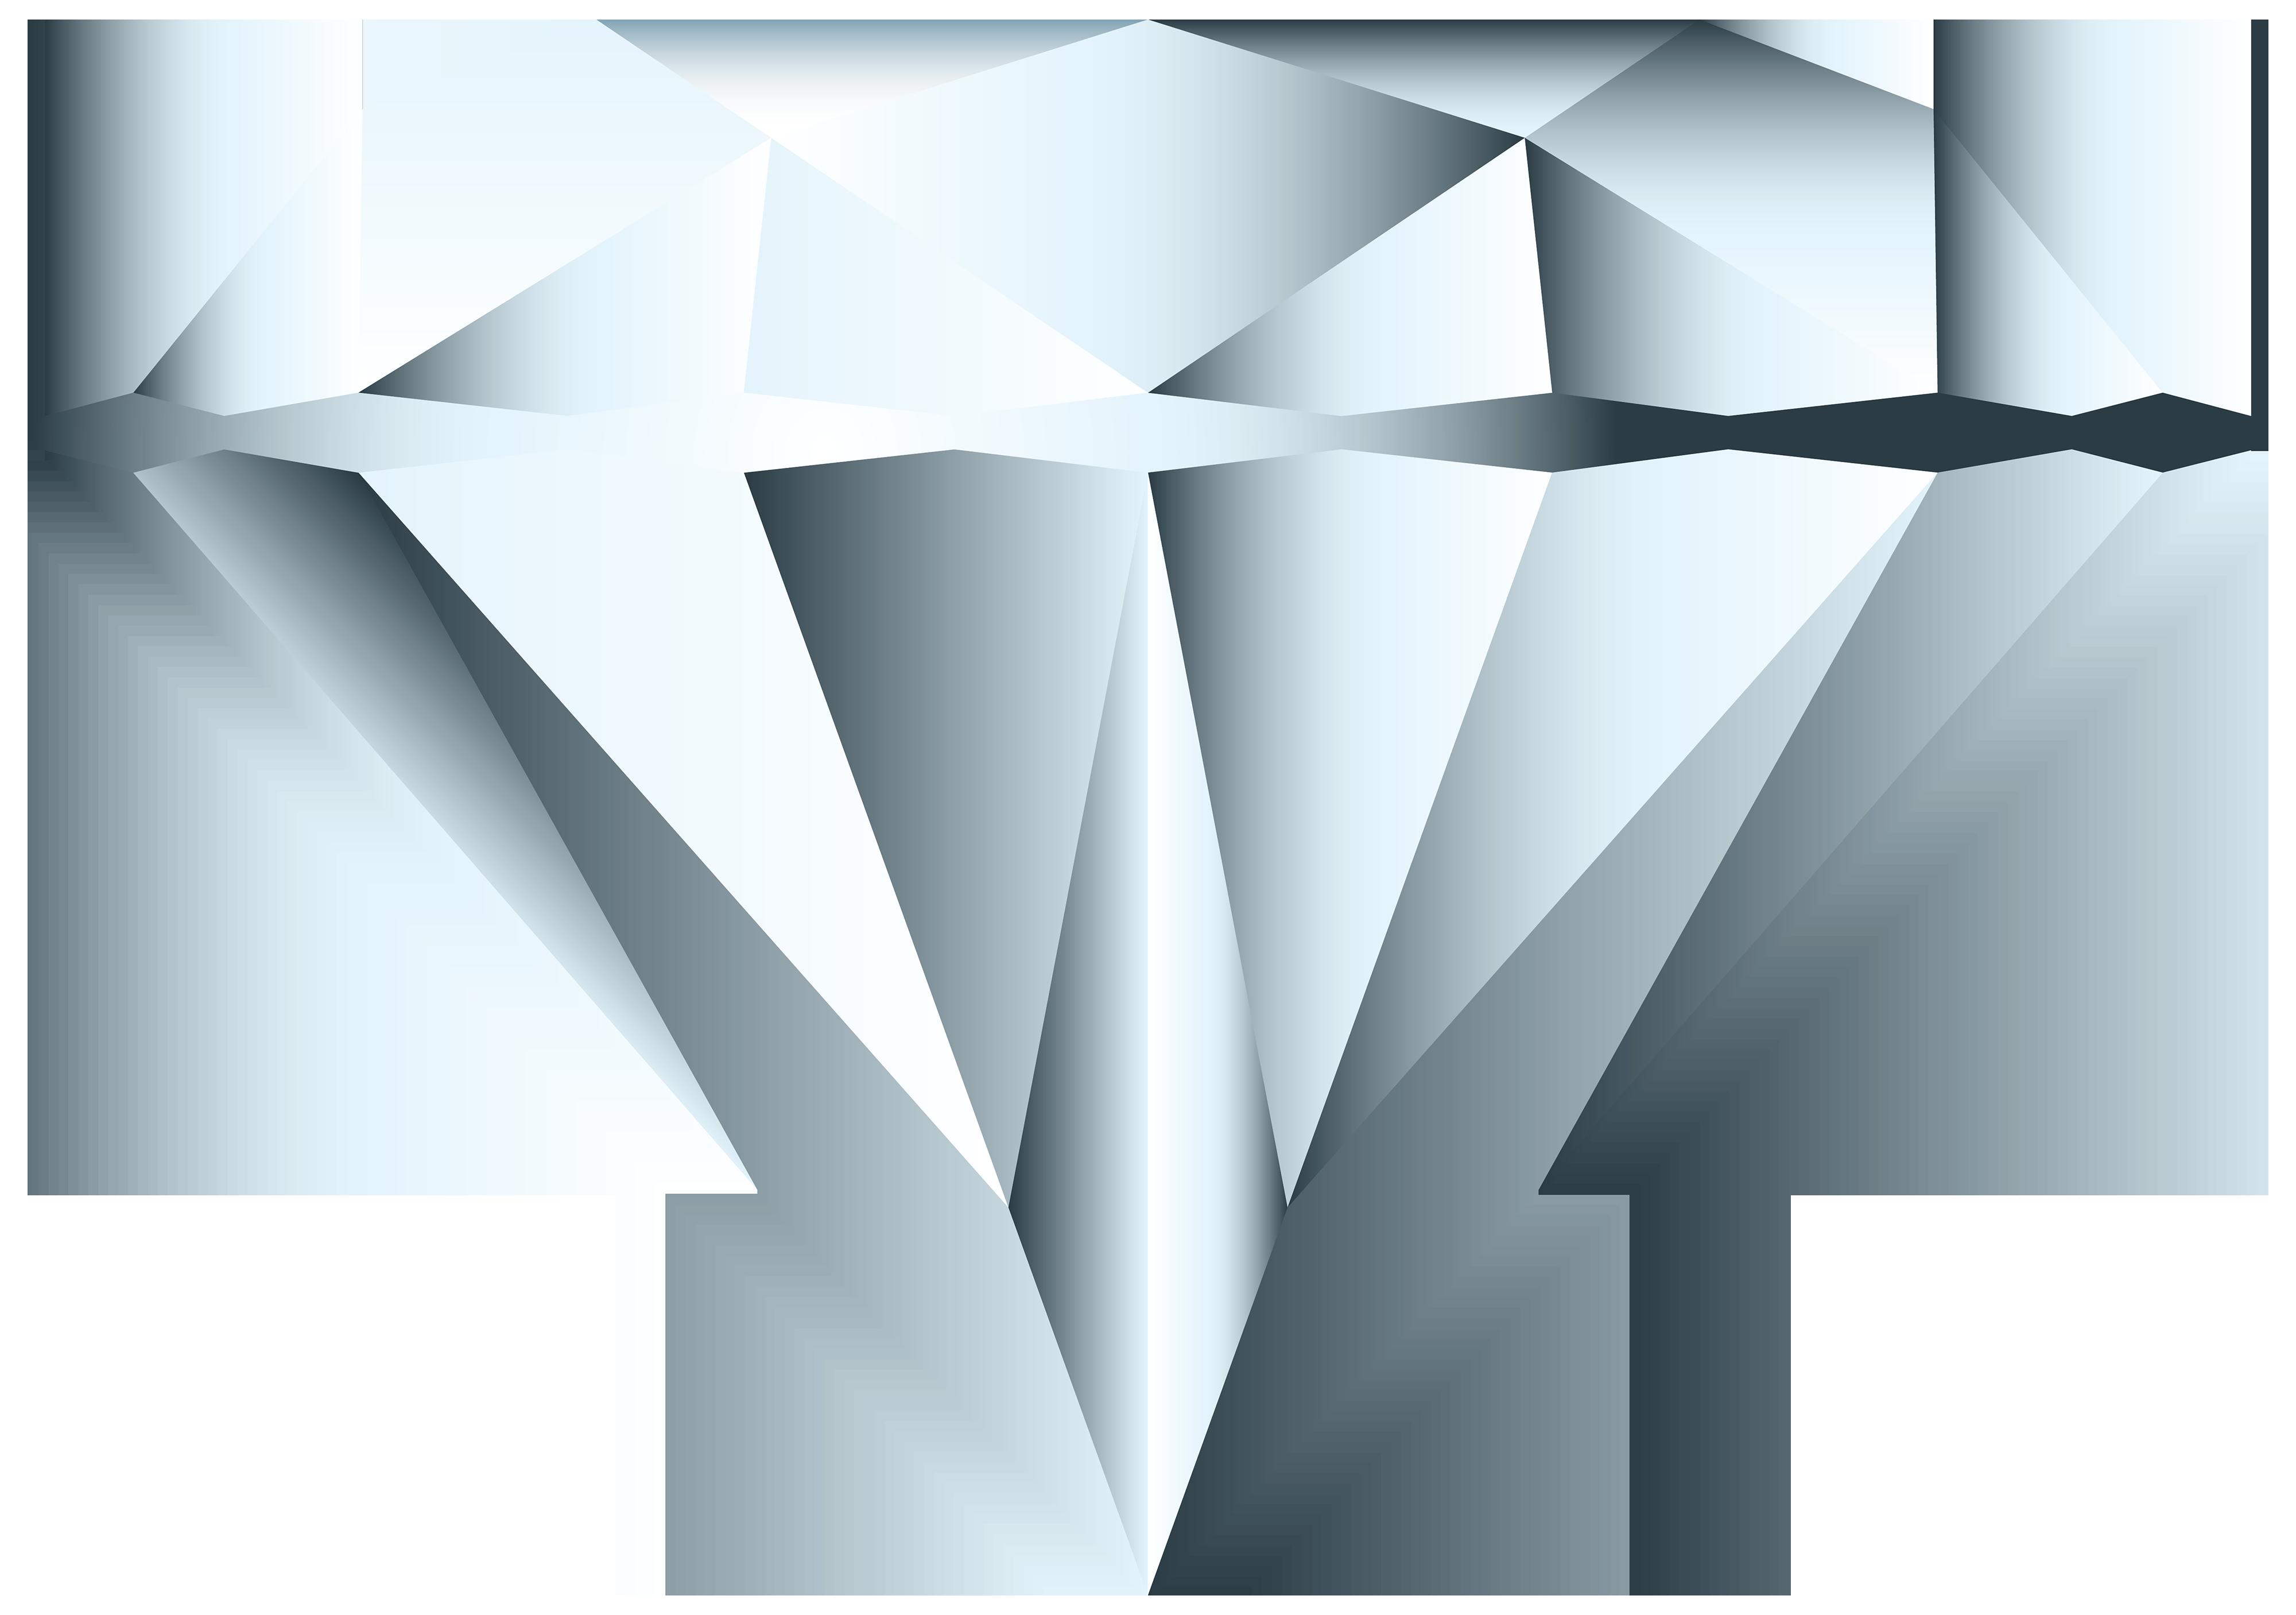 Diamond clipart 2-Diamond clipart 2-11